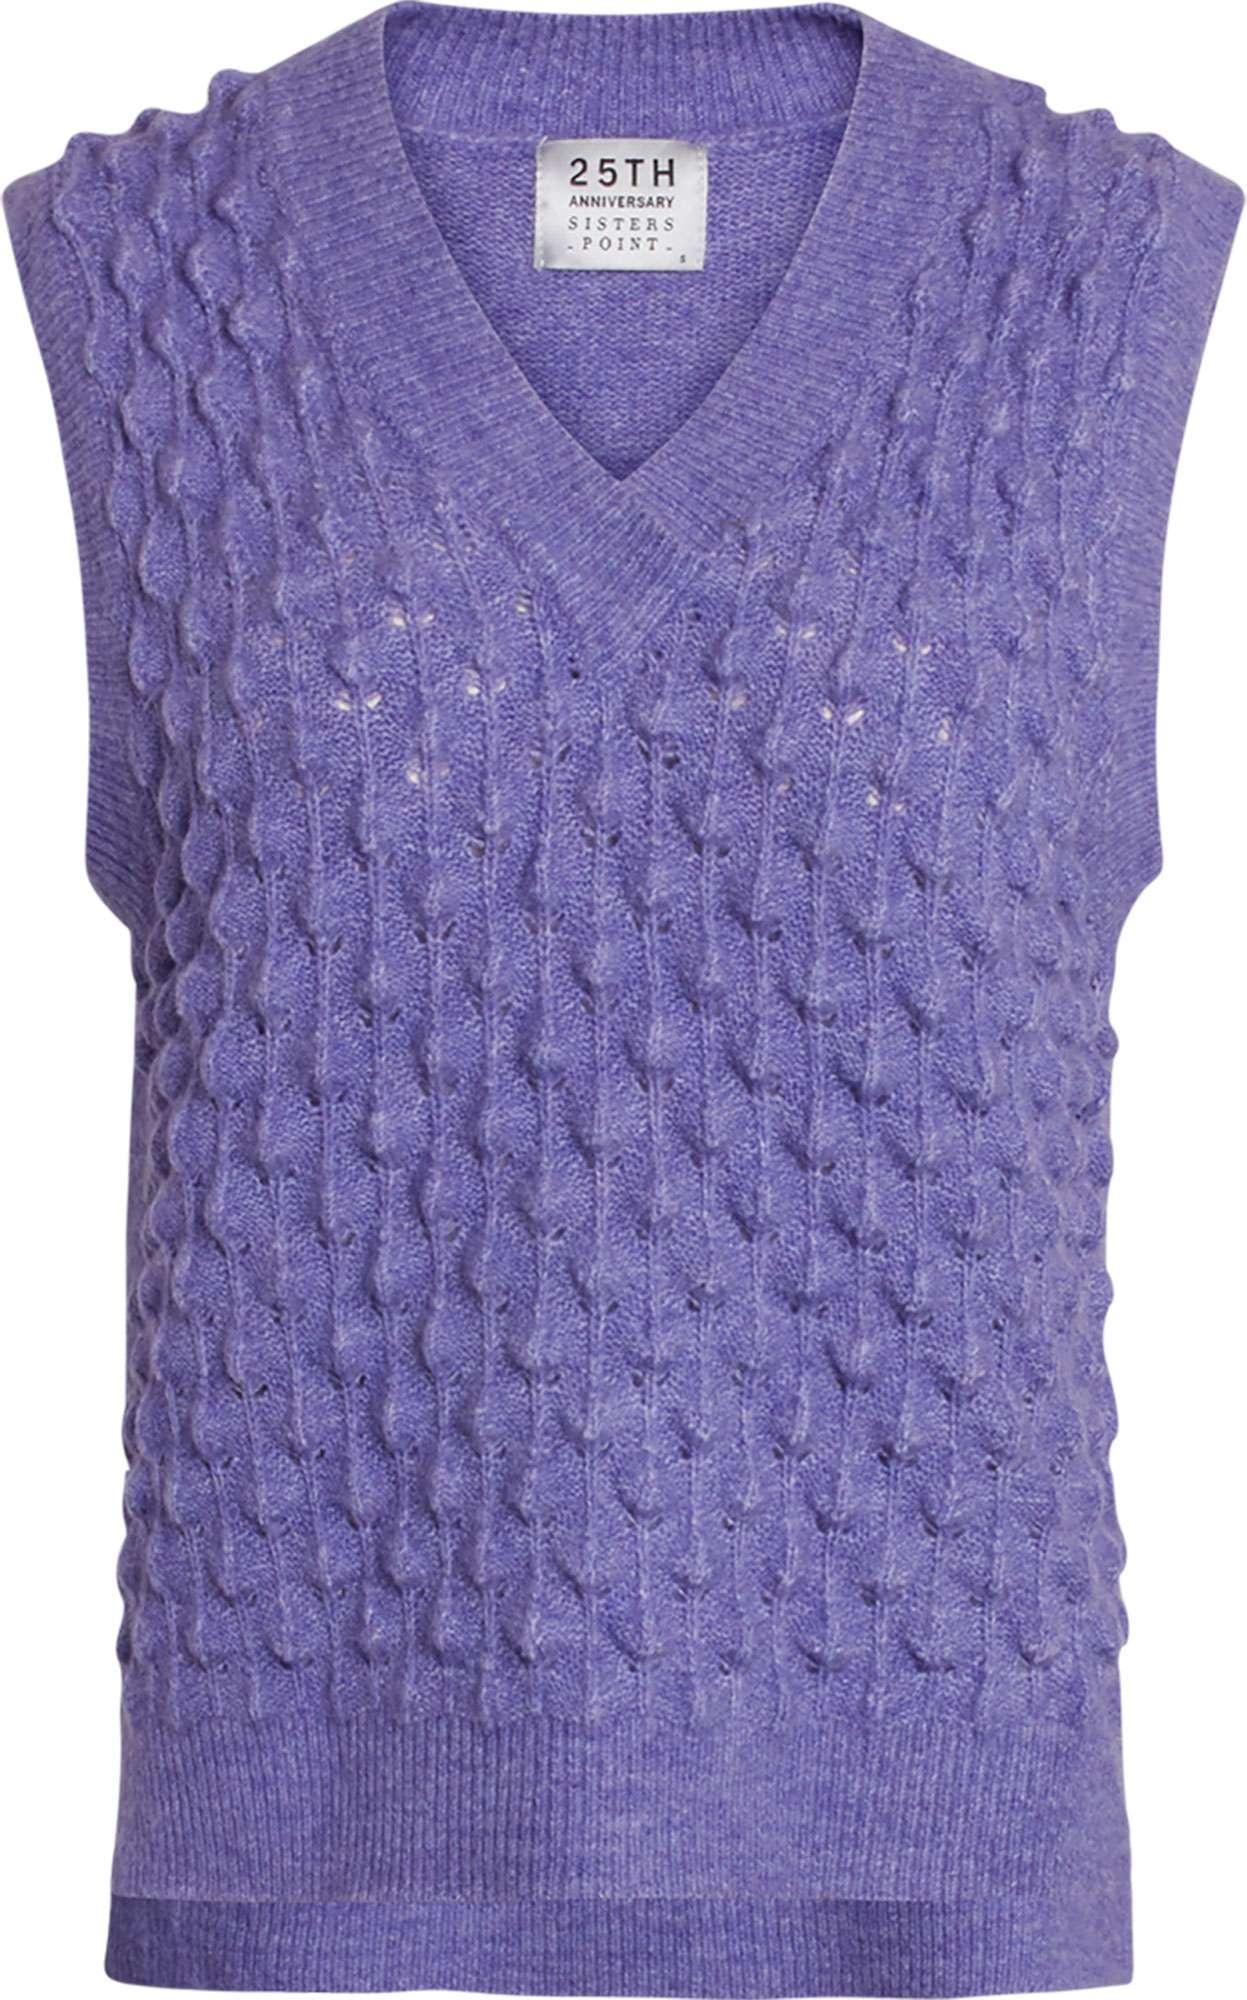 Licca-v.spencer purple mel